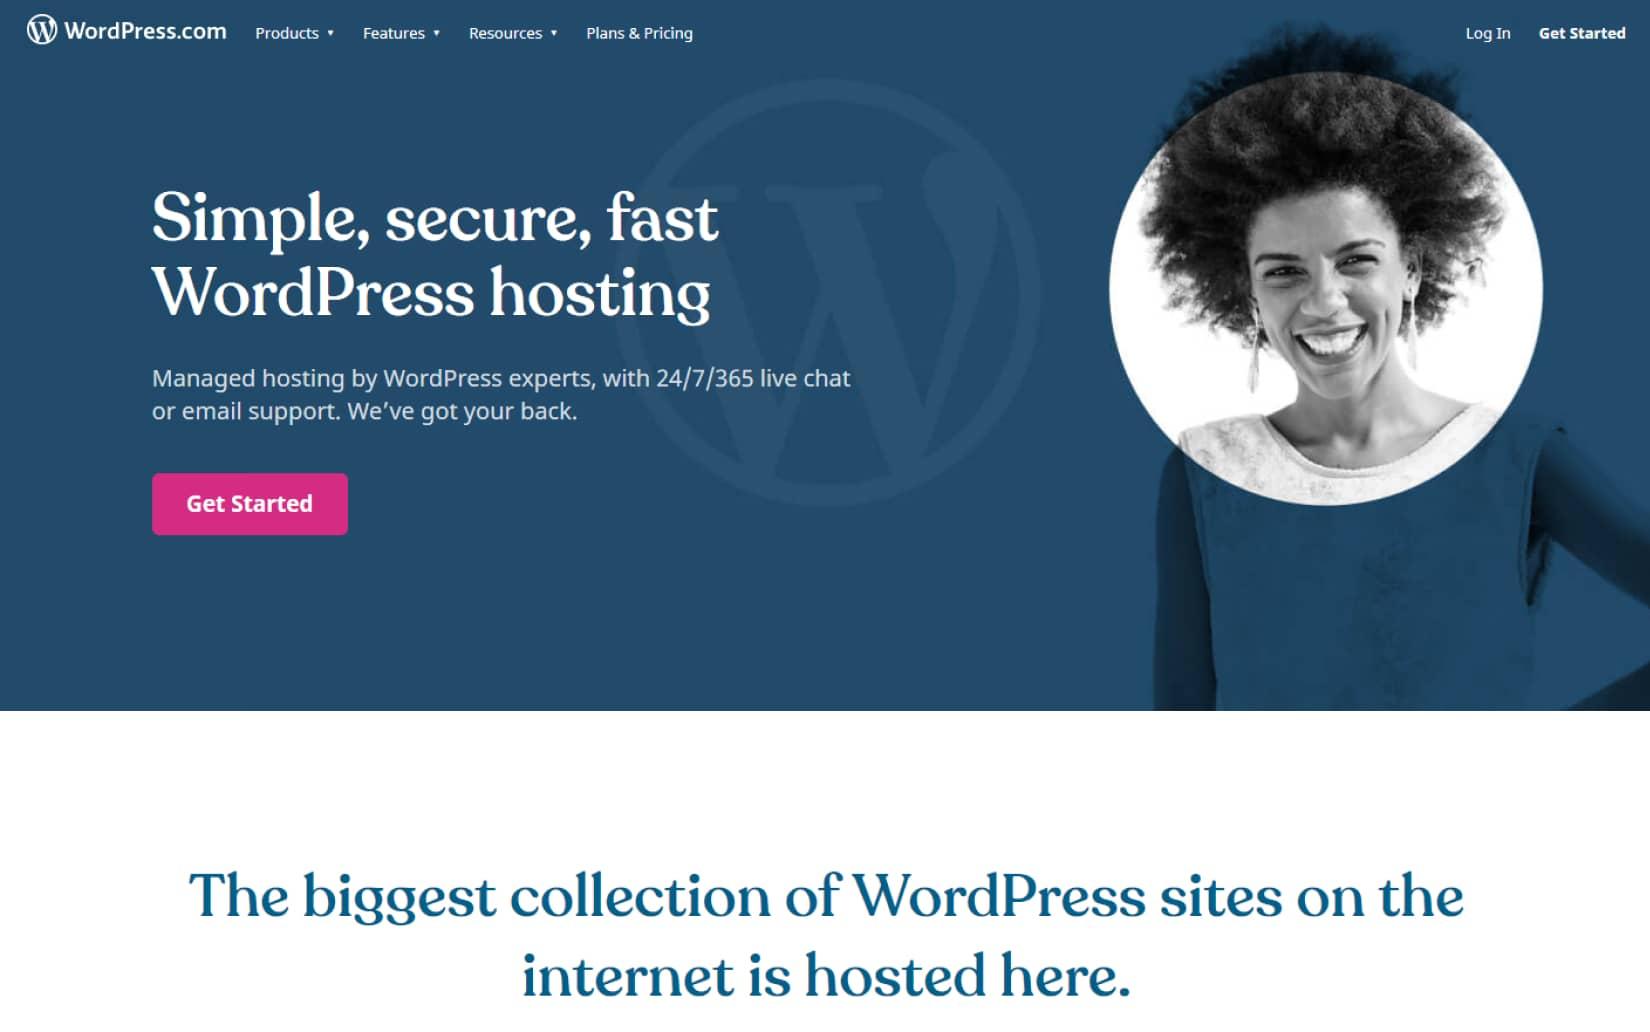 10 Best WooCommerce Hosting Compared 2020 WordPress.com